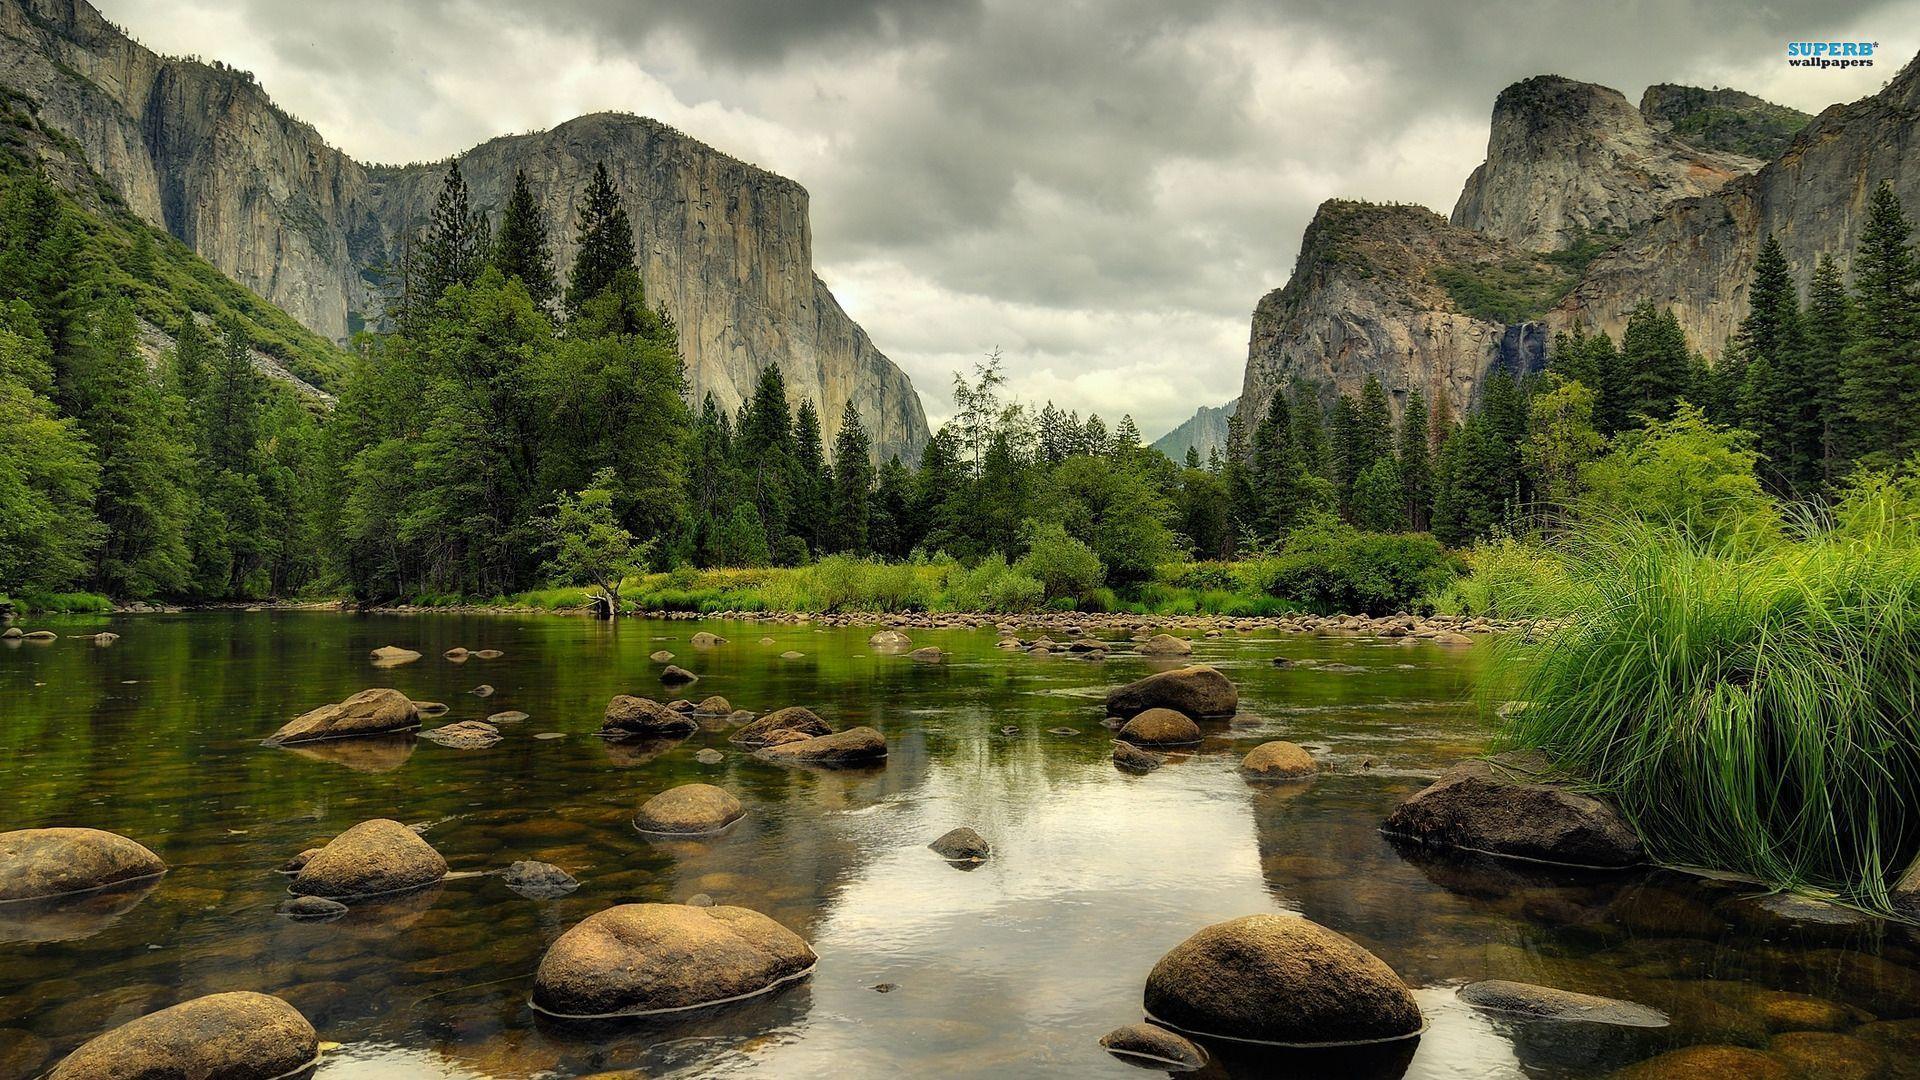 Yosemite National Park Information Facts Tiverton Foundation 1920x1080